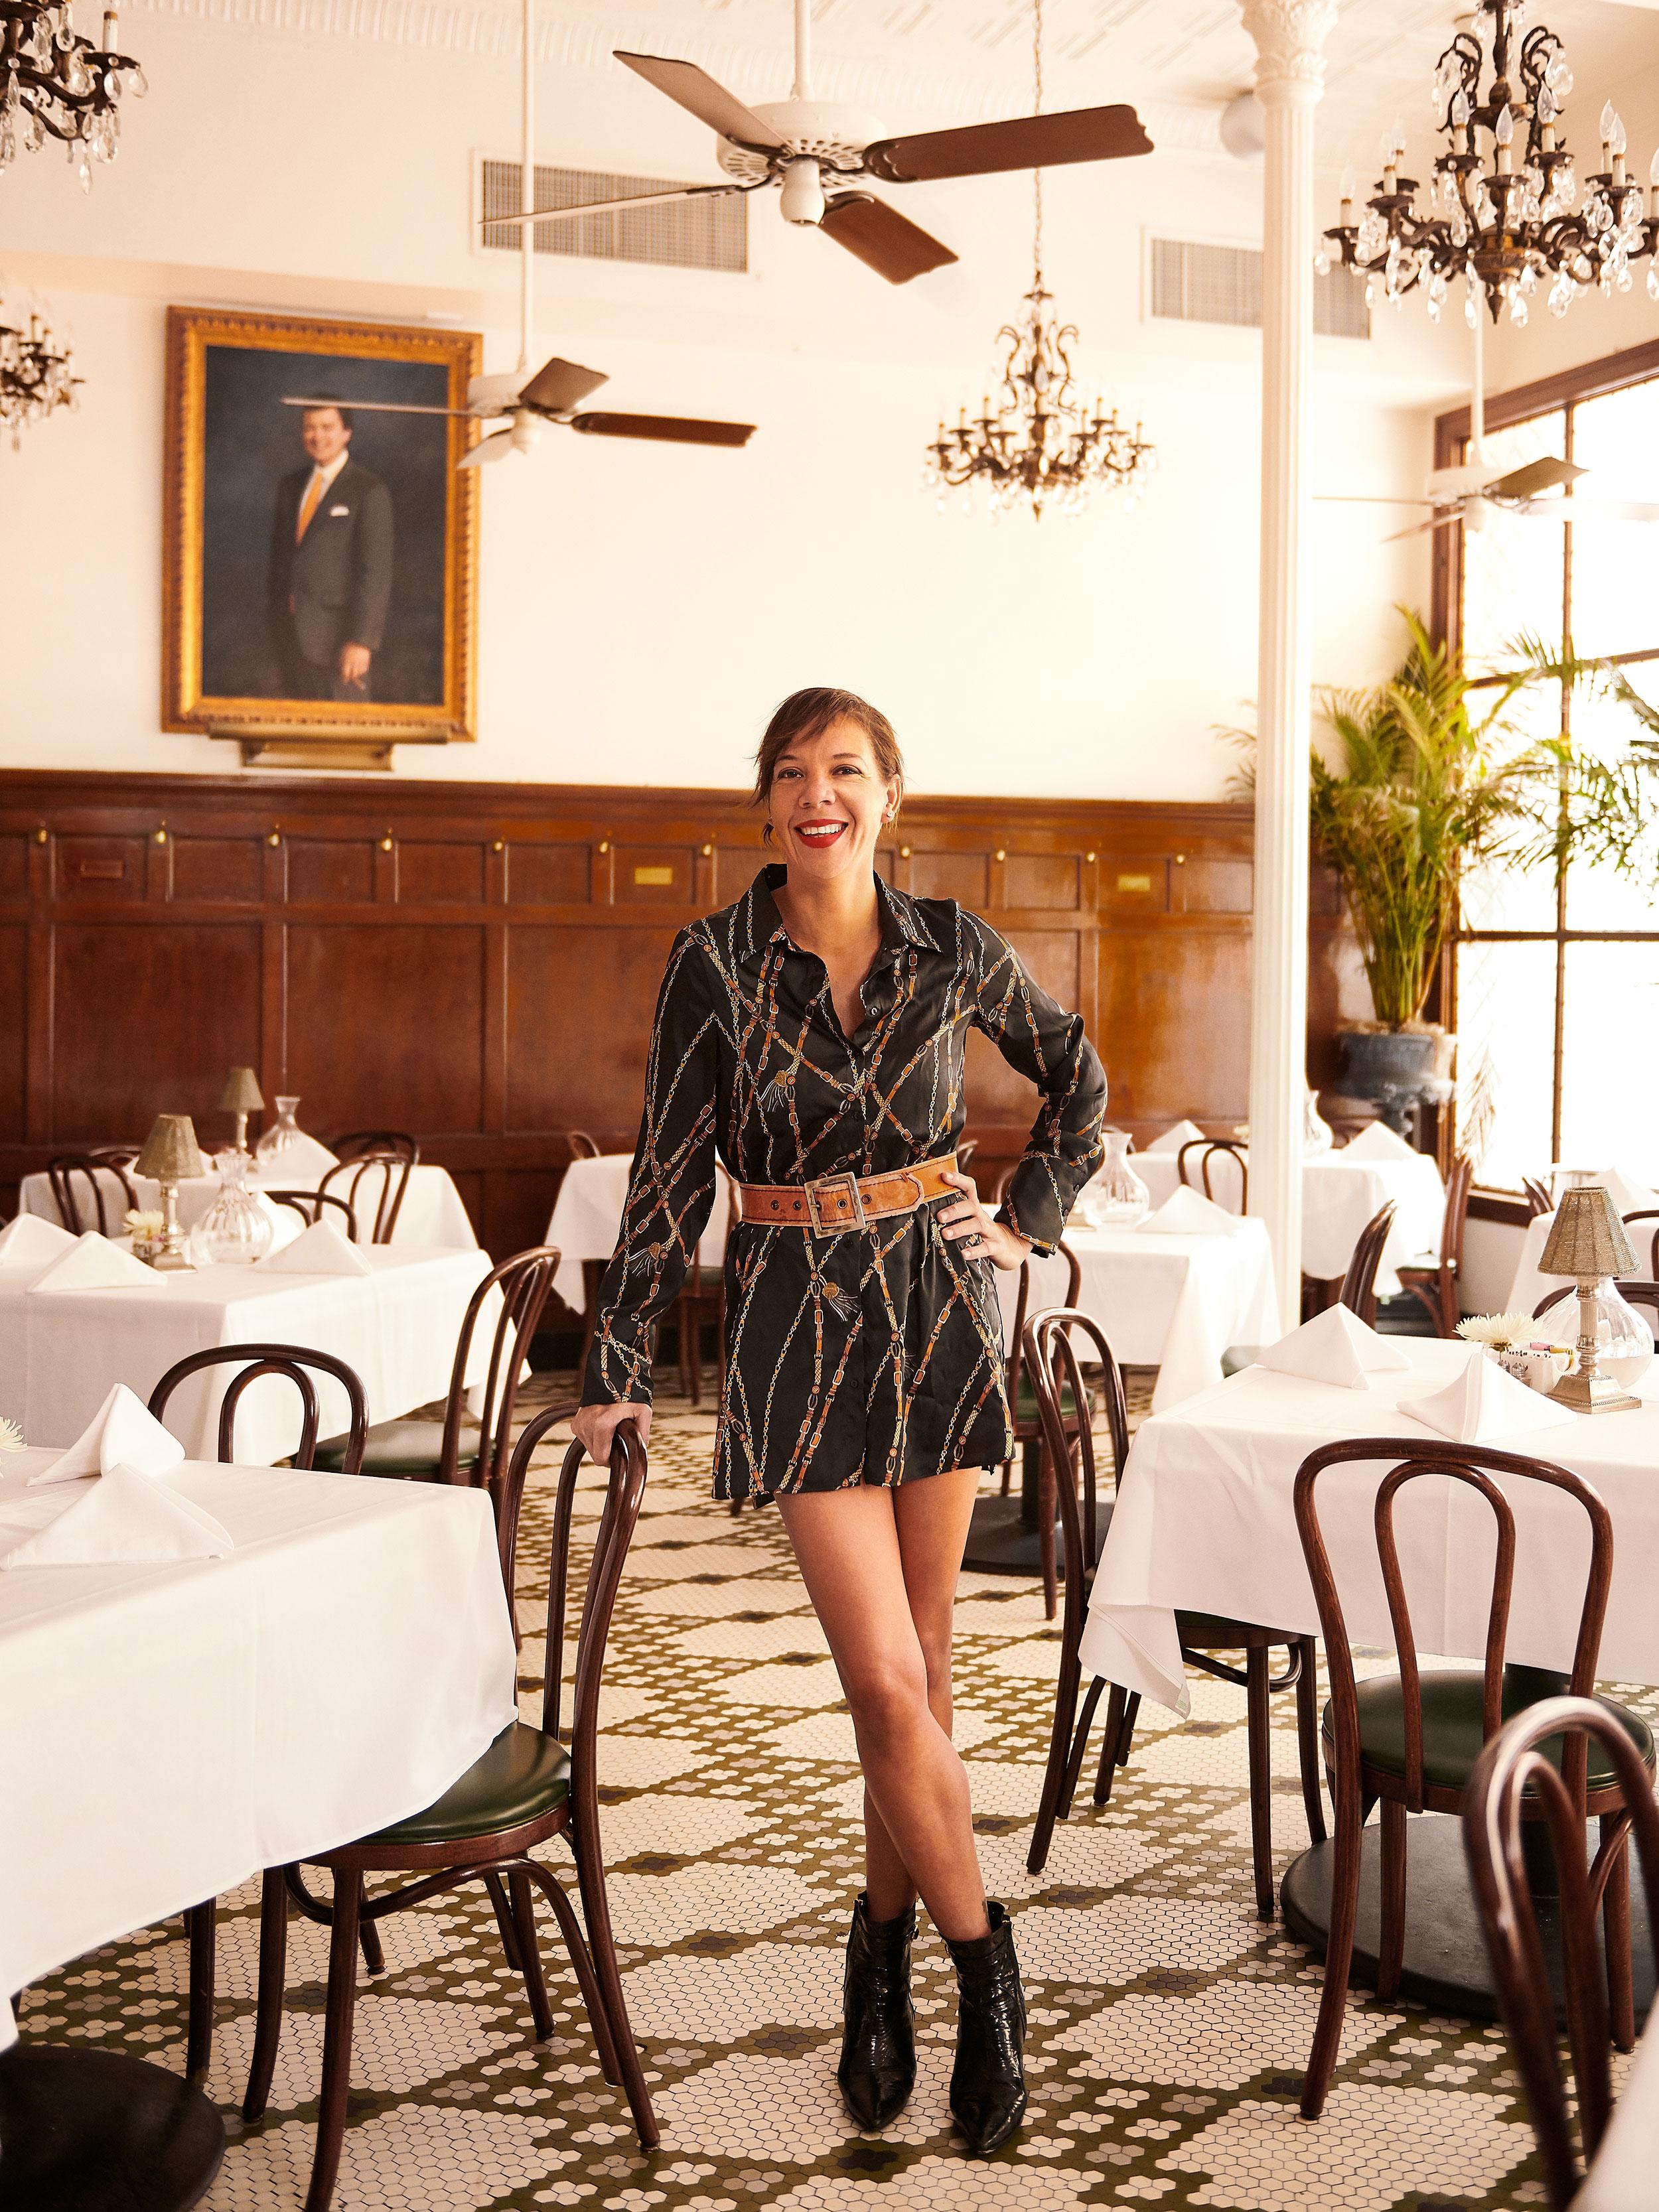 Chef Nina Compton - Robb Report